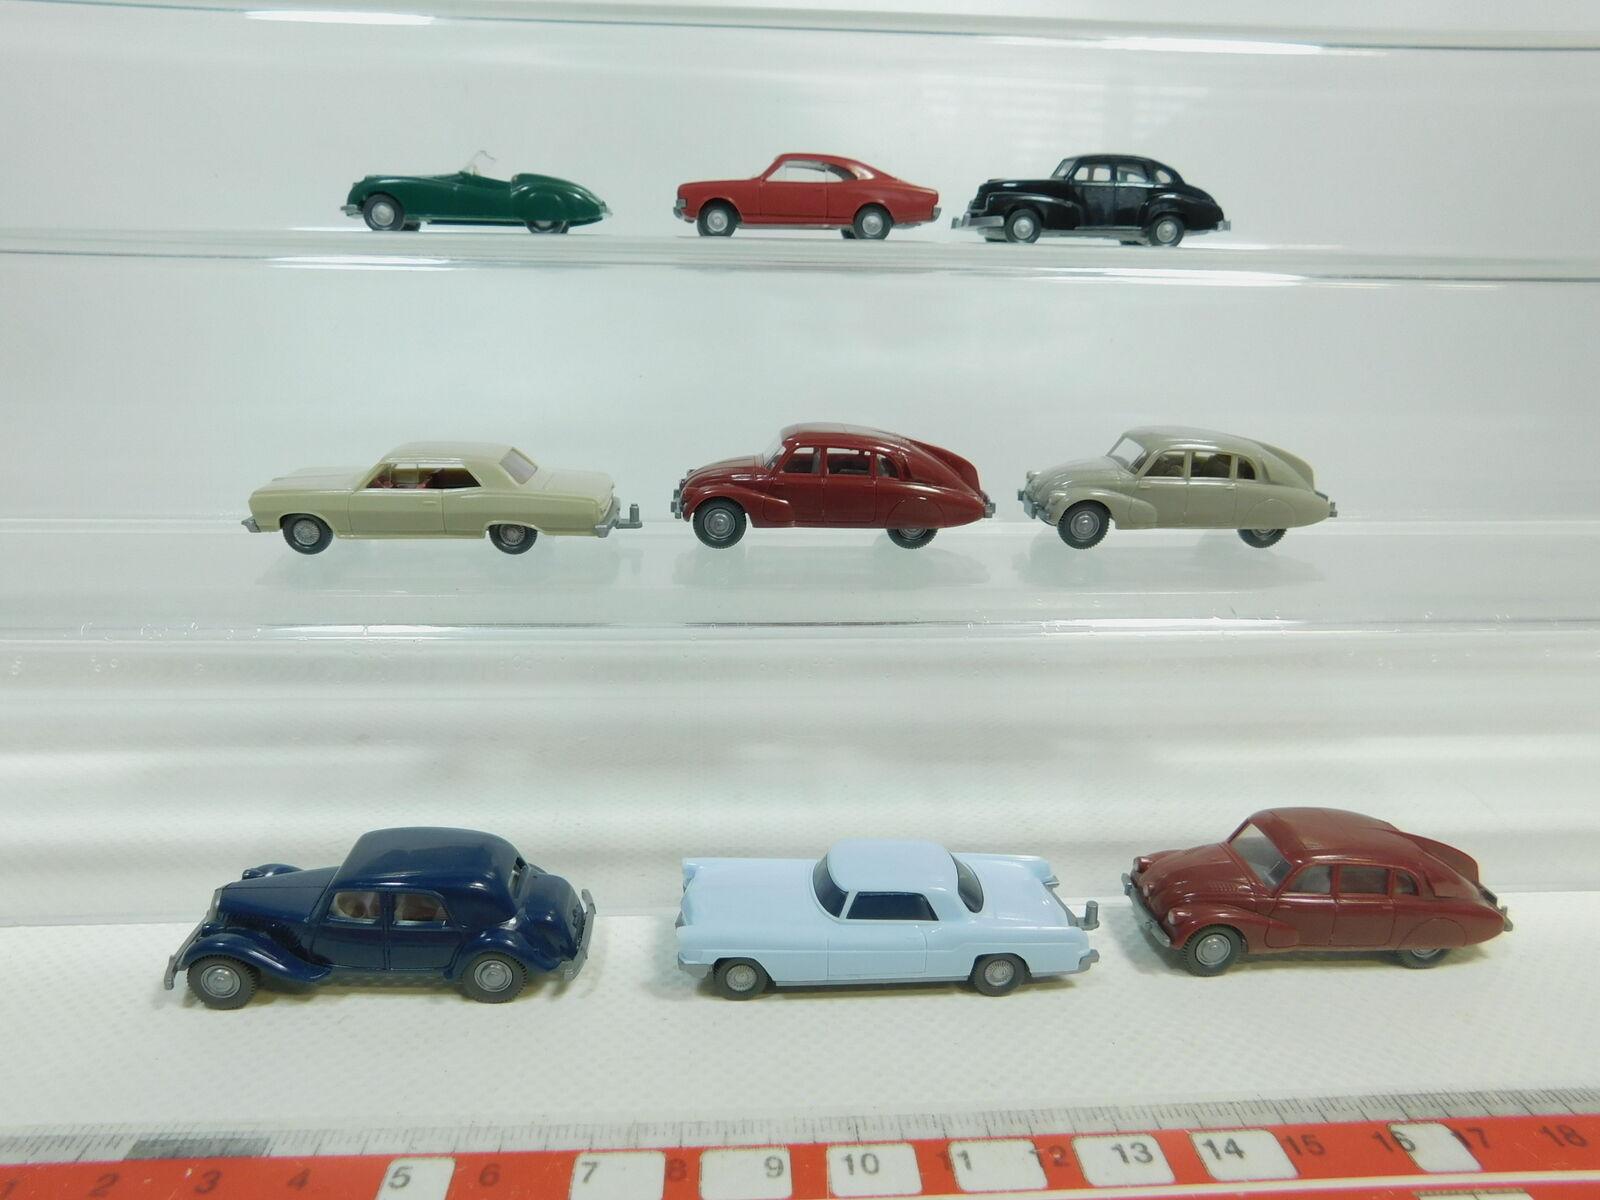 BK72-0,5x Wiking H0 1 87 PKW  Opel Kapitän 51+Jaguar+Citroen+Tatra etc, s.g.